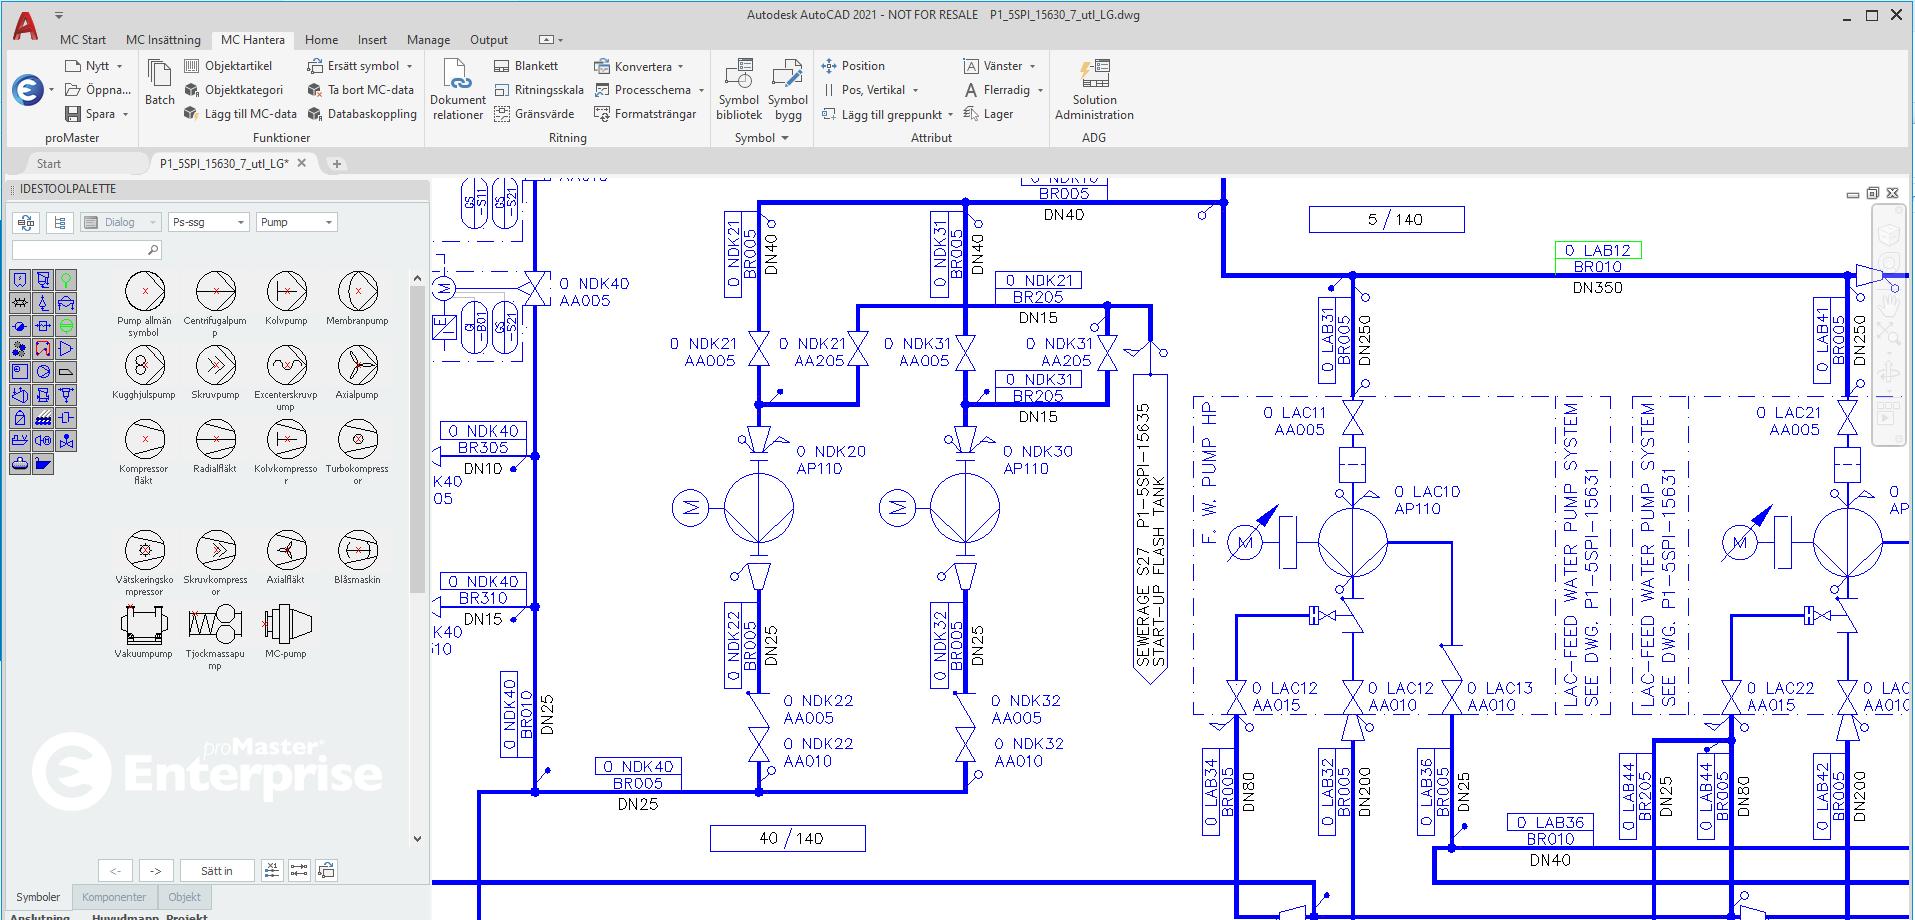 proMaster design enterprise 2021 vit